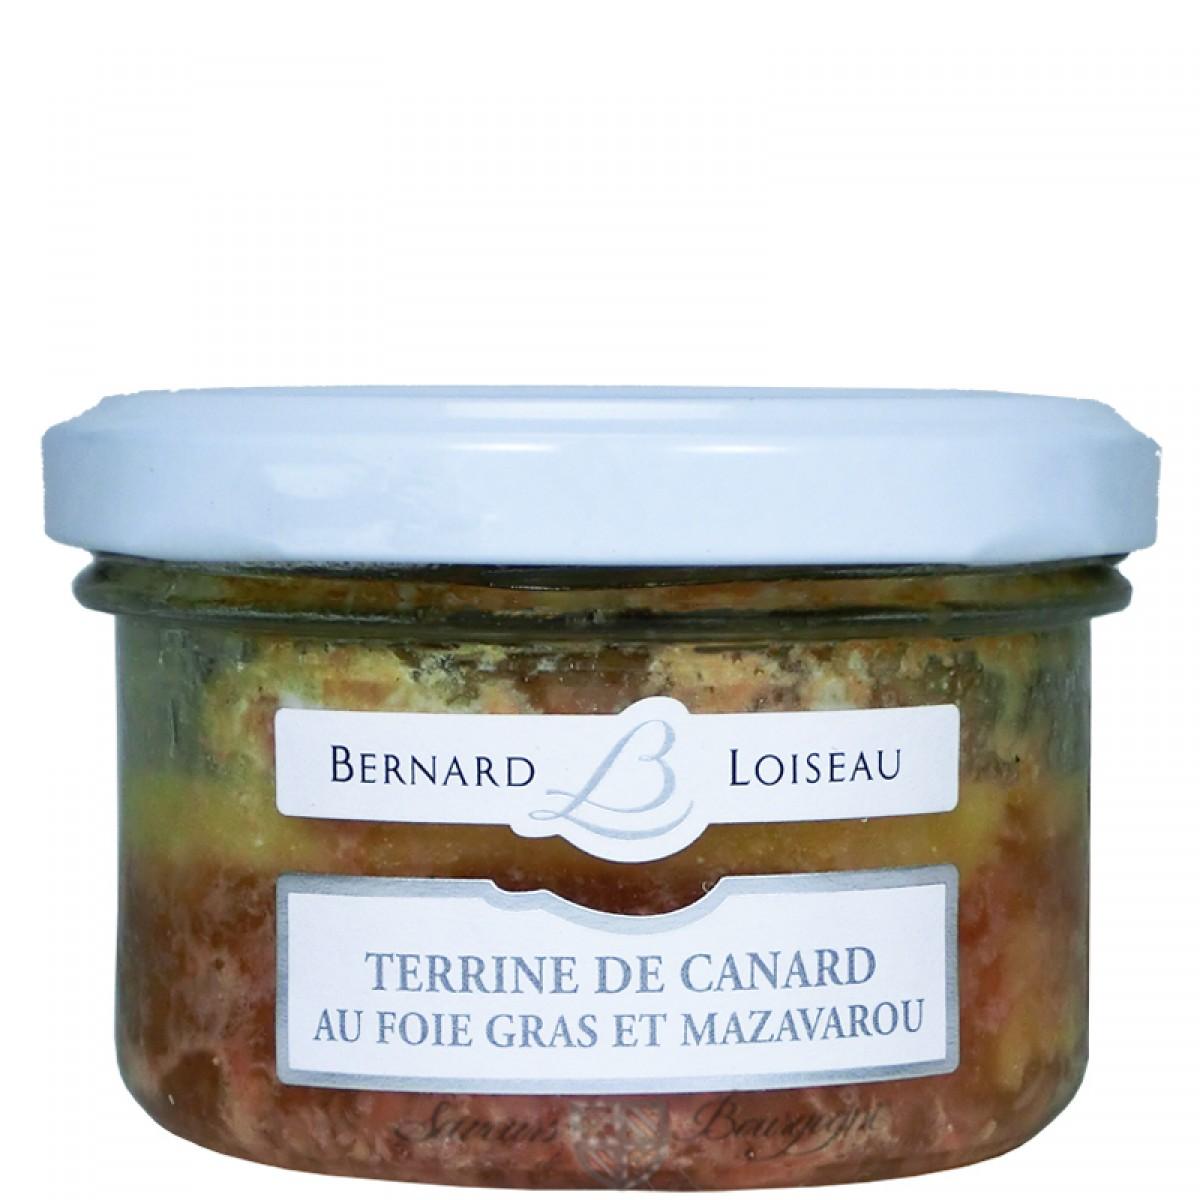 terrine de canard au foie gras et mazavarou 80g saveurs. Black Bedroom Furniture Sets. Home Design Ideas